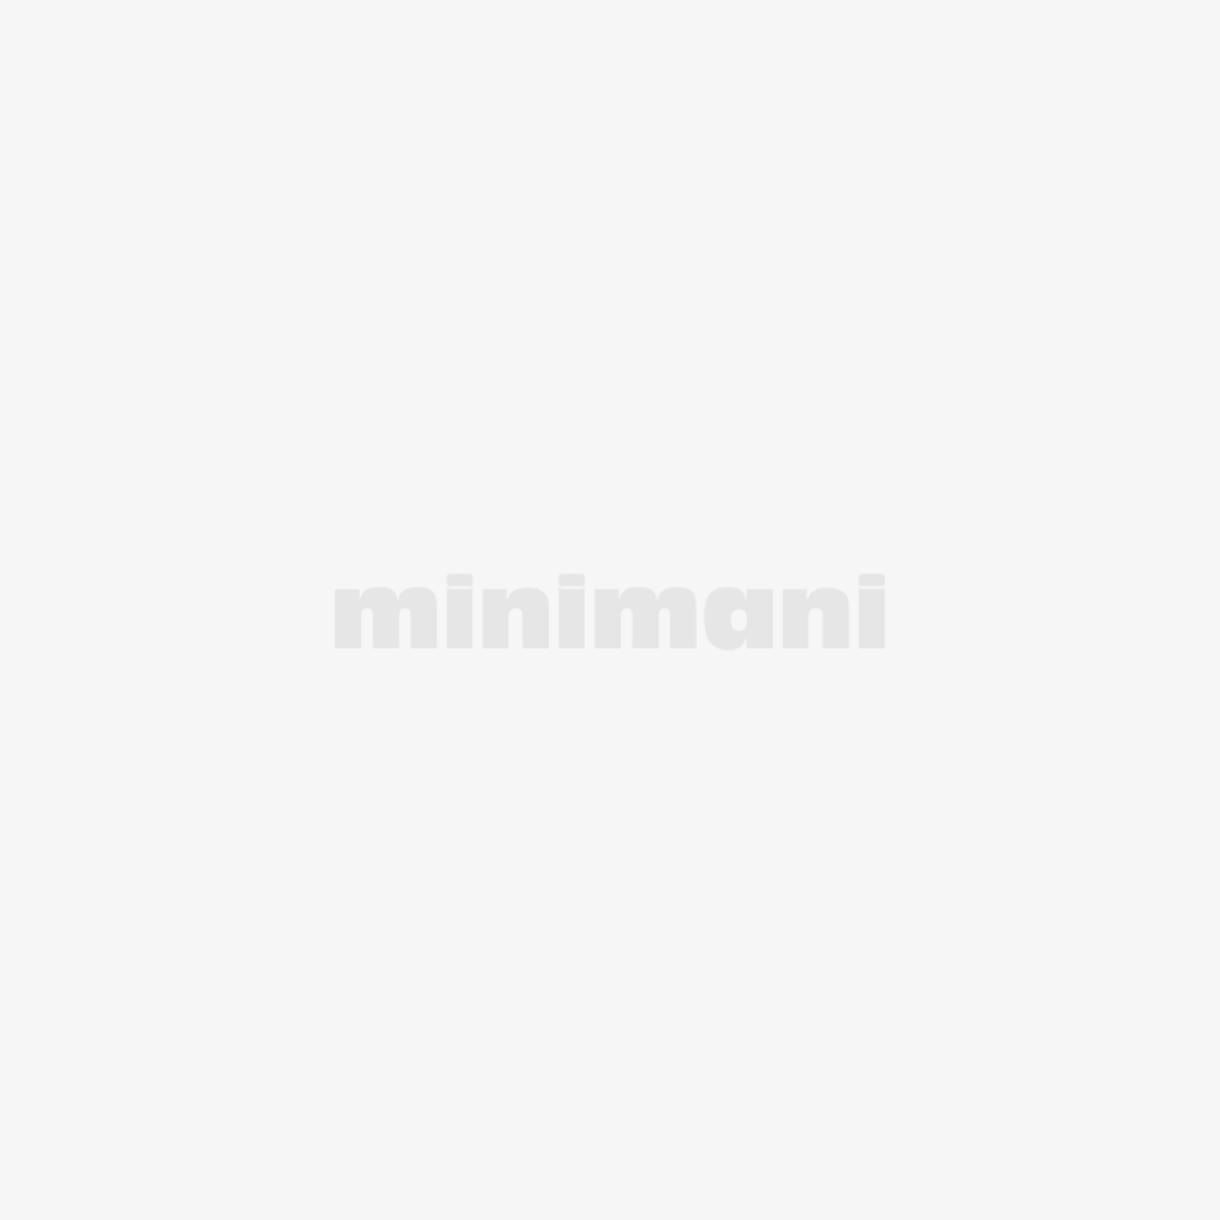 KUIVAPUKU FLYTOVERALL 845XB MUSTA